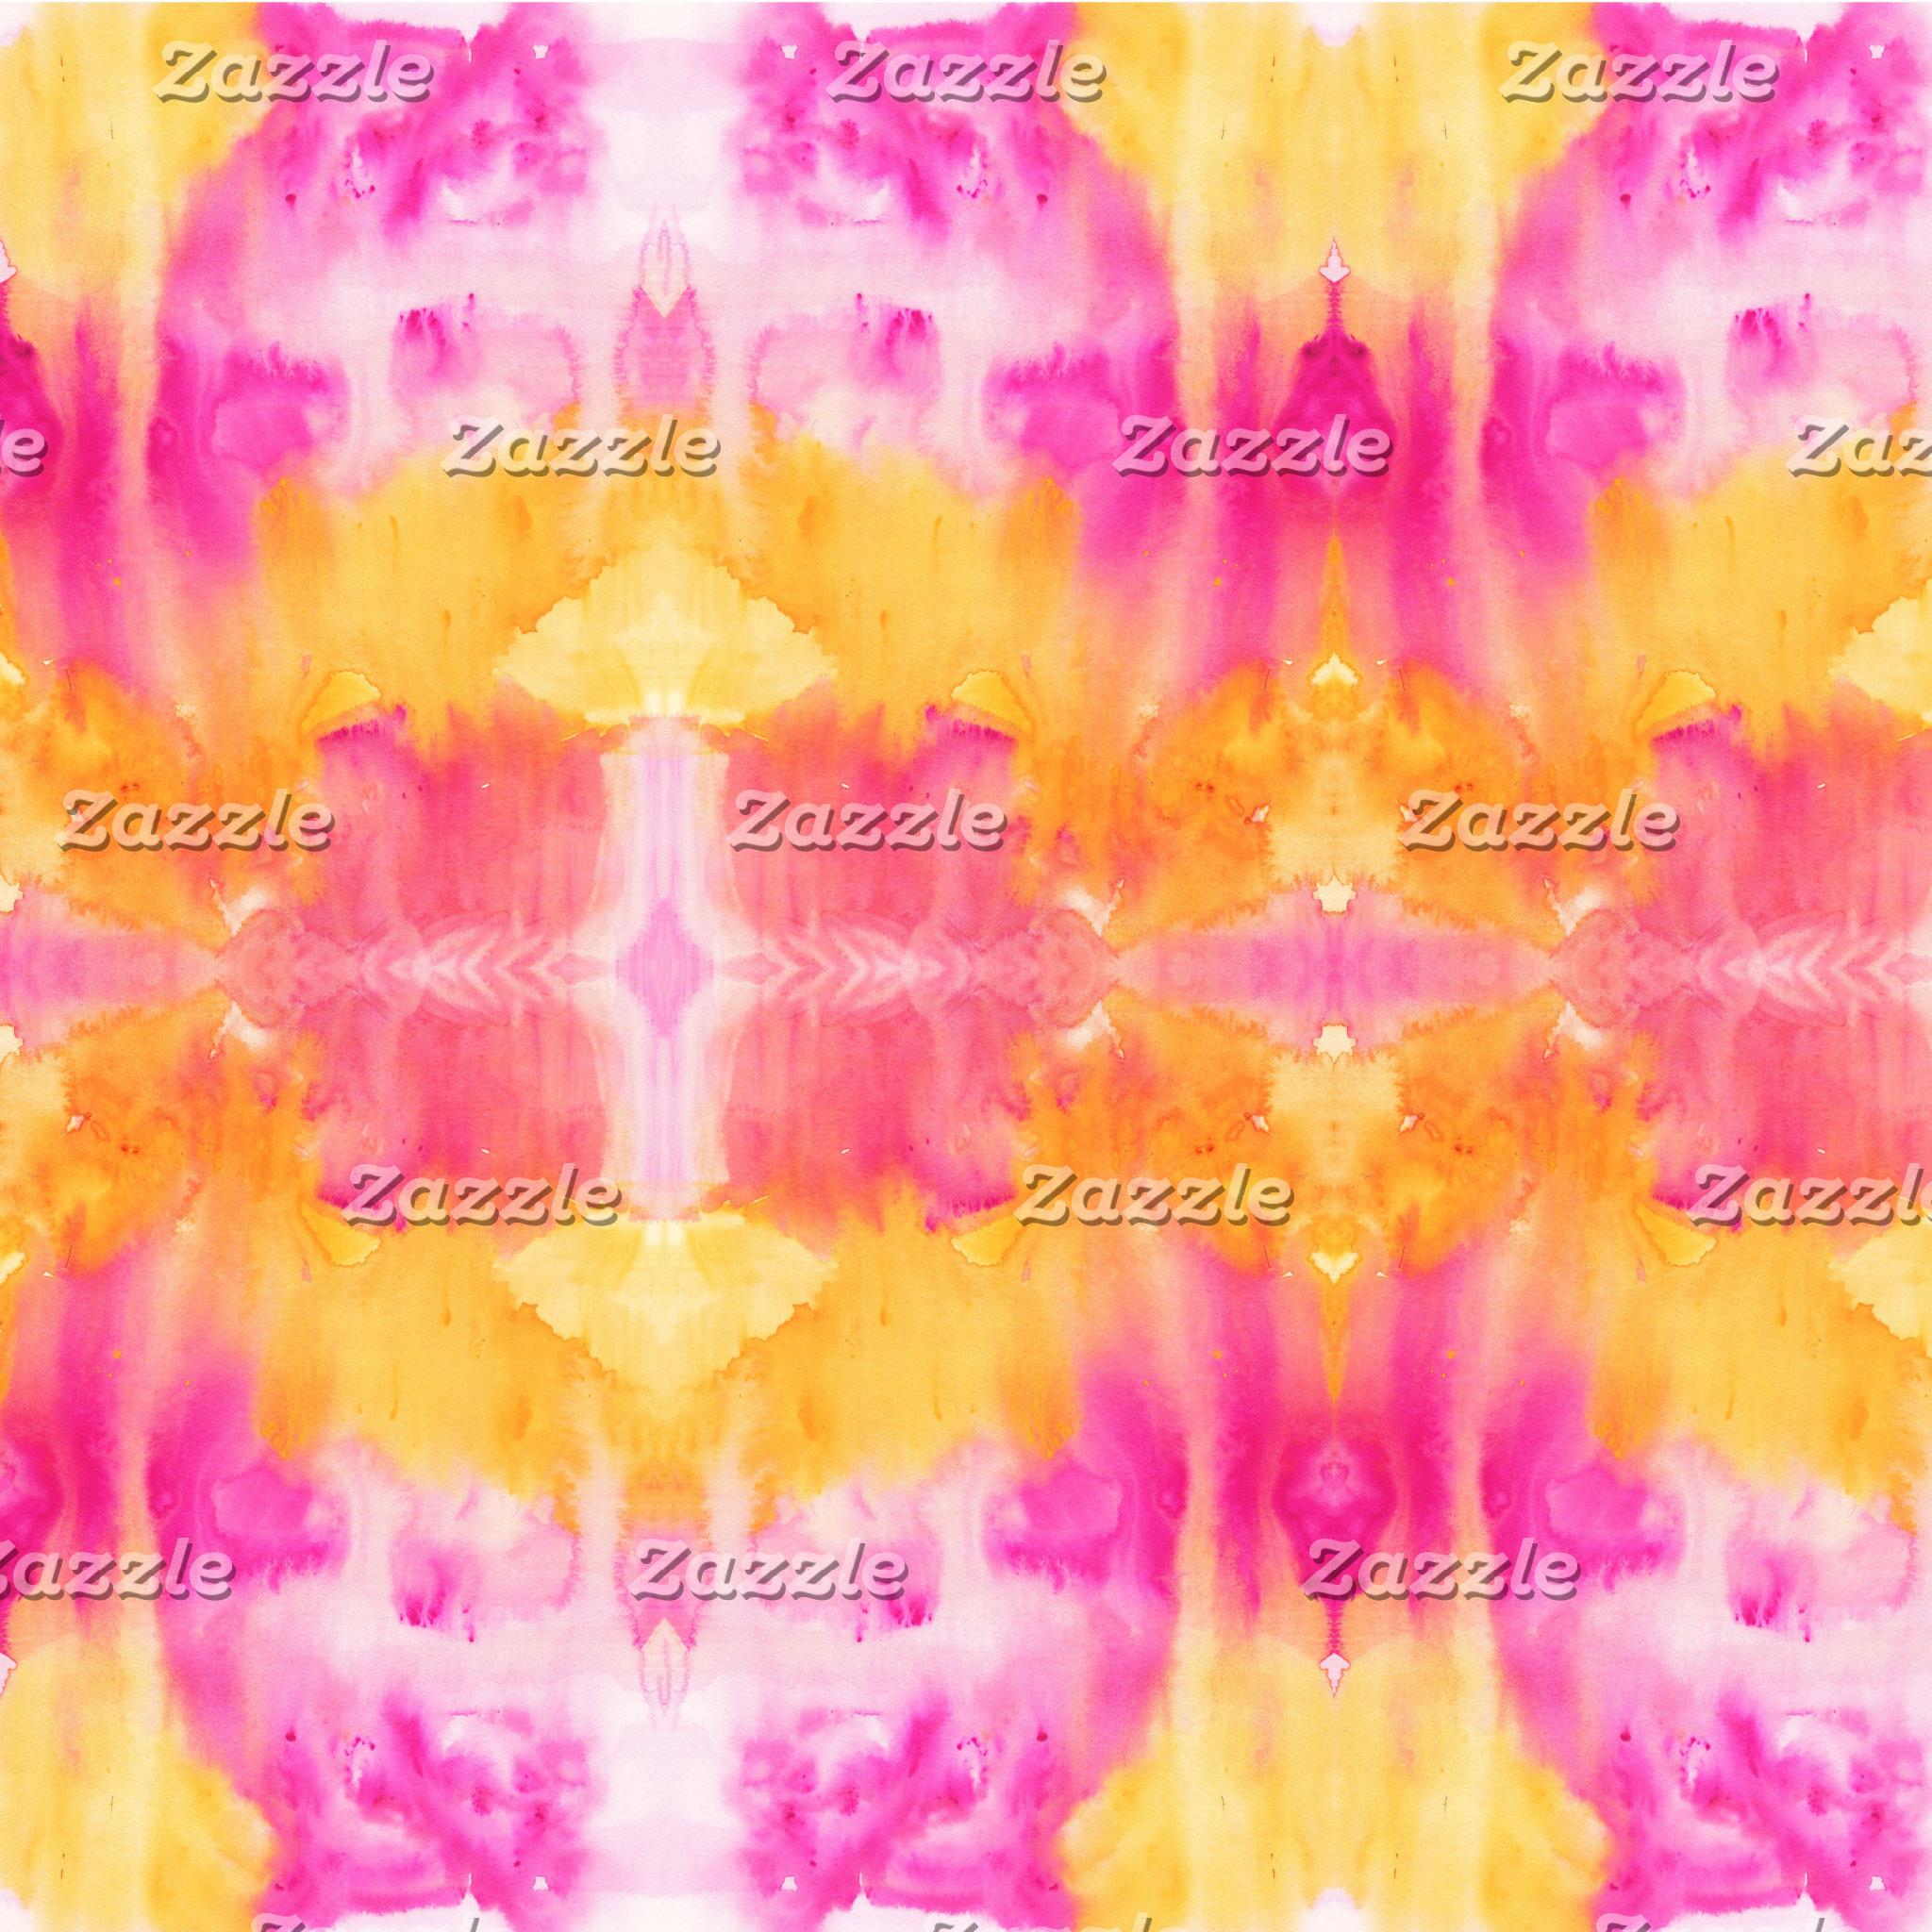 Fire-Pink-yellow-orange watercolor